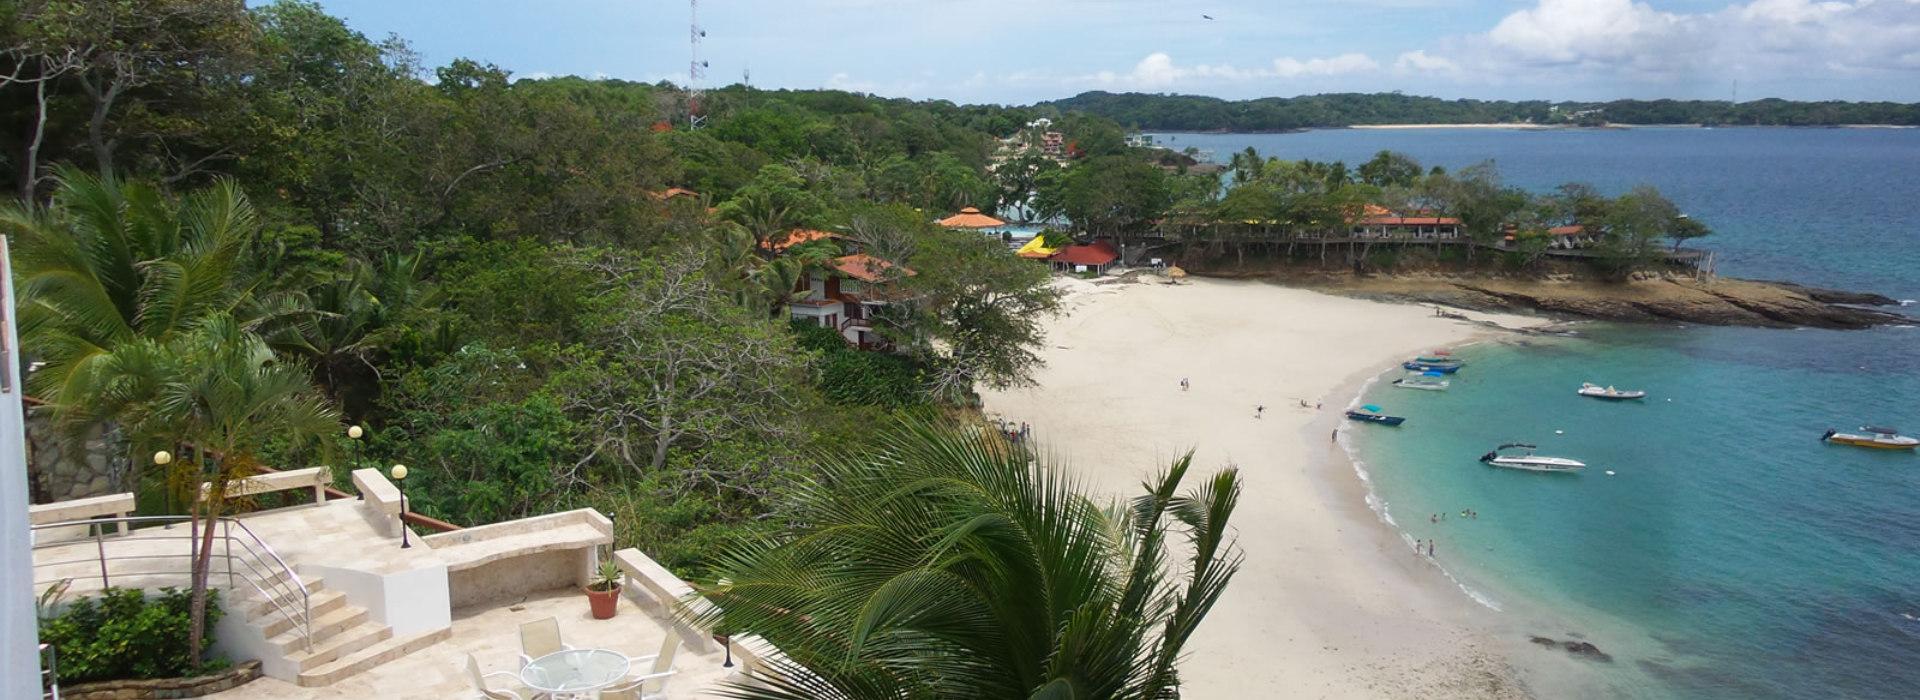 Las Perlas Island day tour